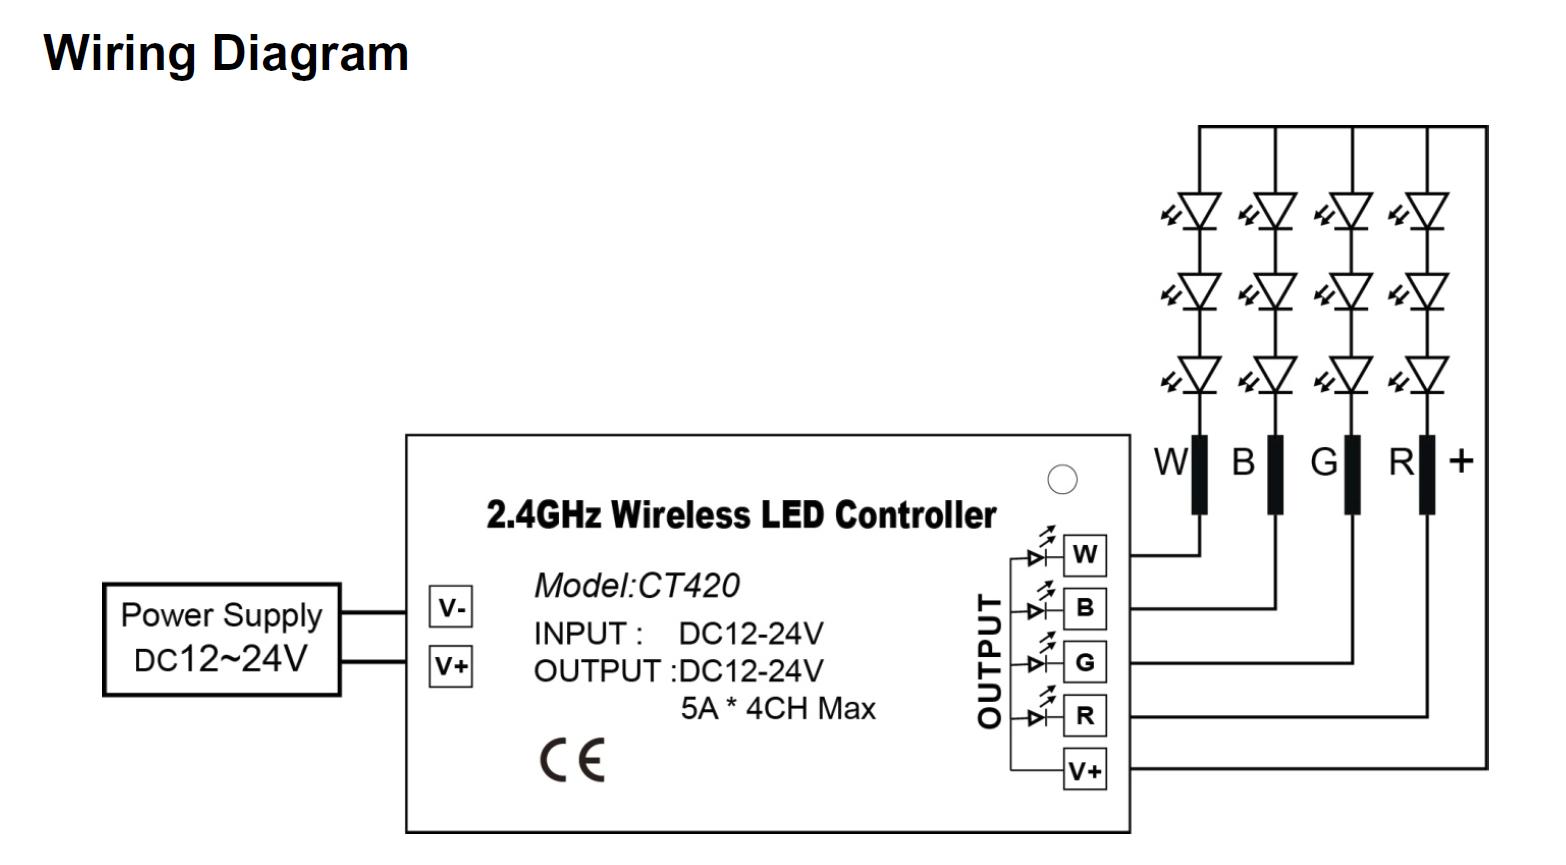 ct420-wiring-diagram.png